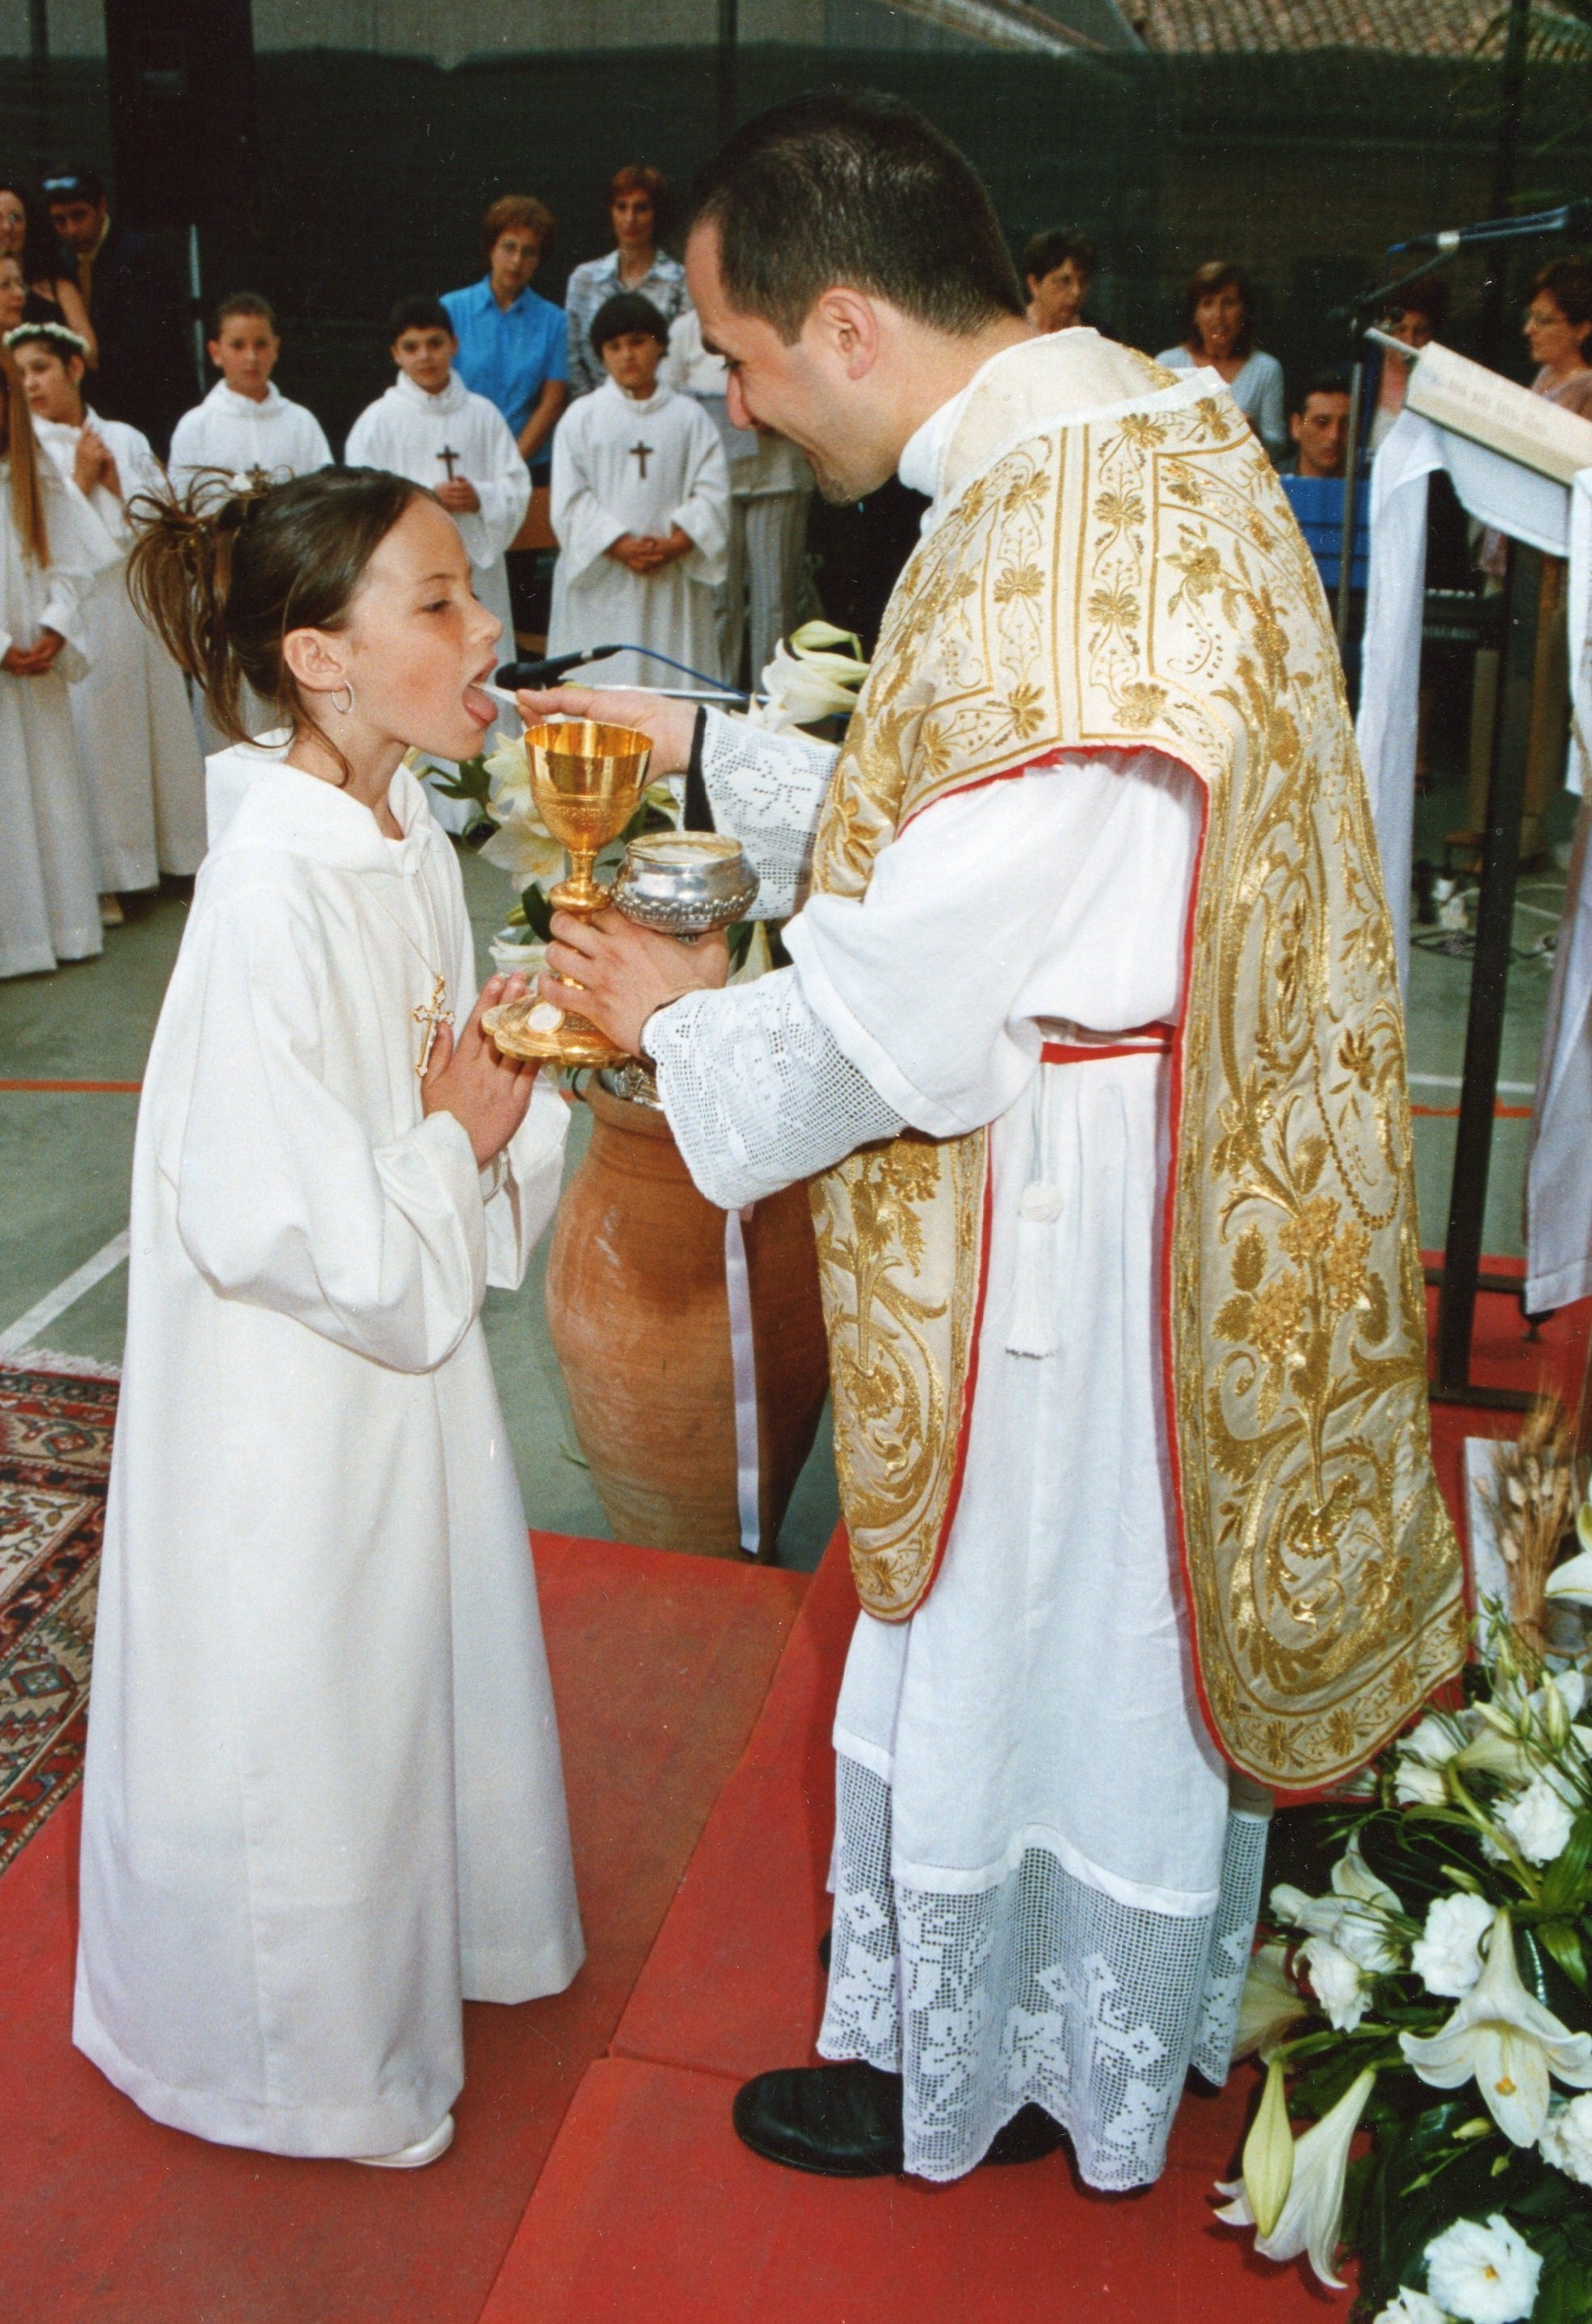 Rite Of The Eucharist